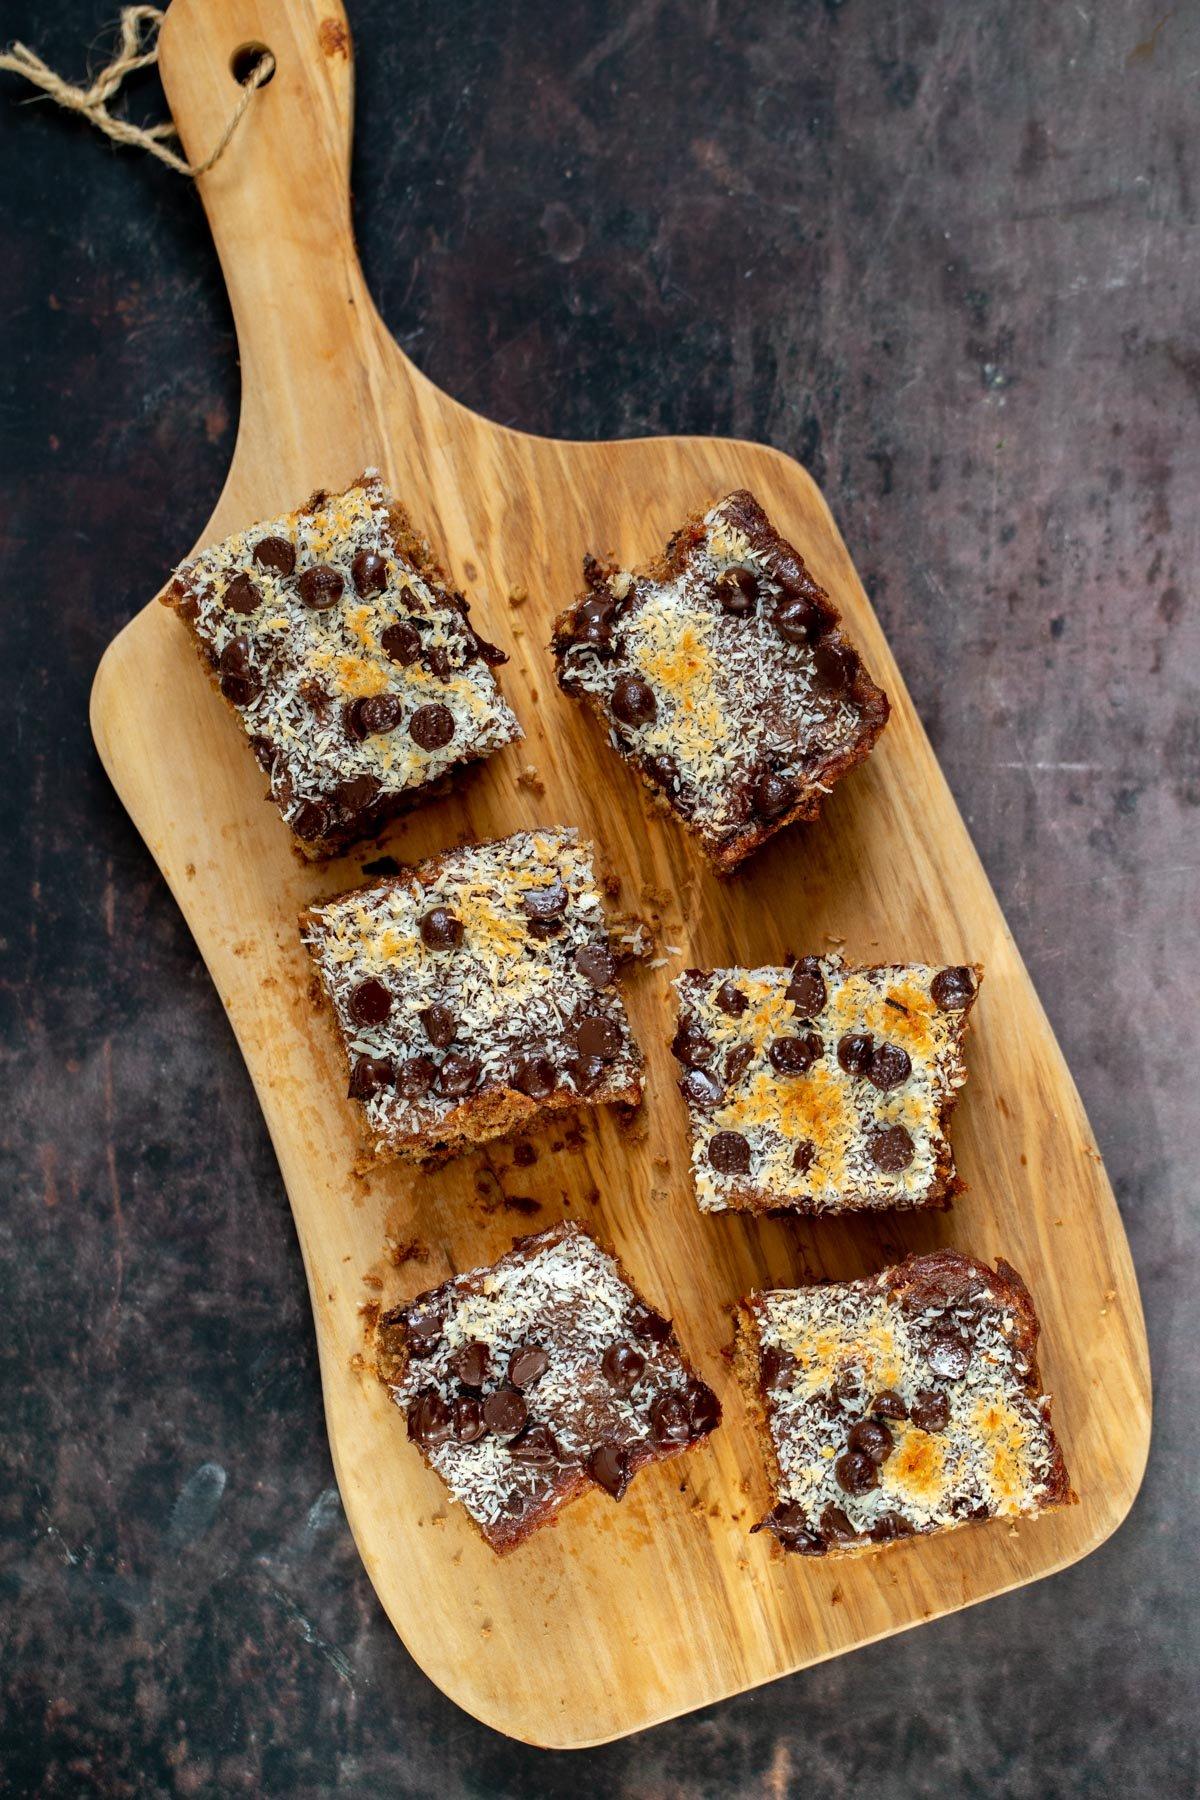 vegan oatmeal date caramel snack bars on a wooden board